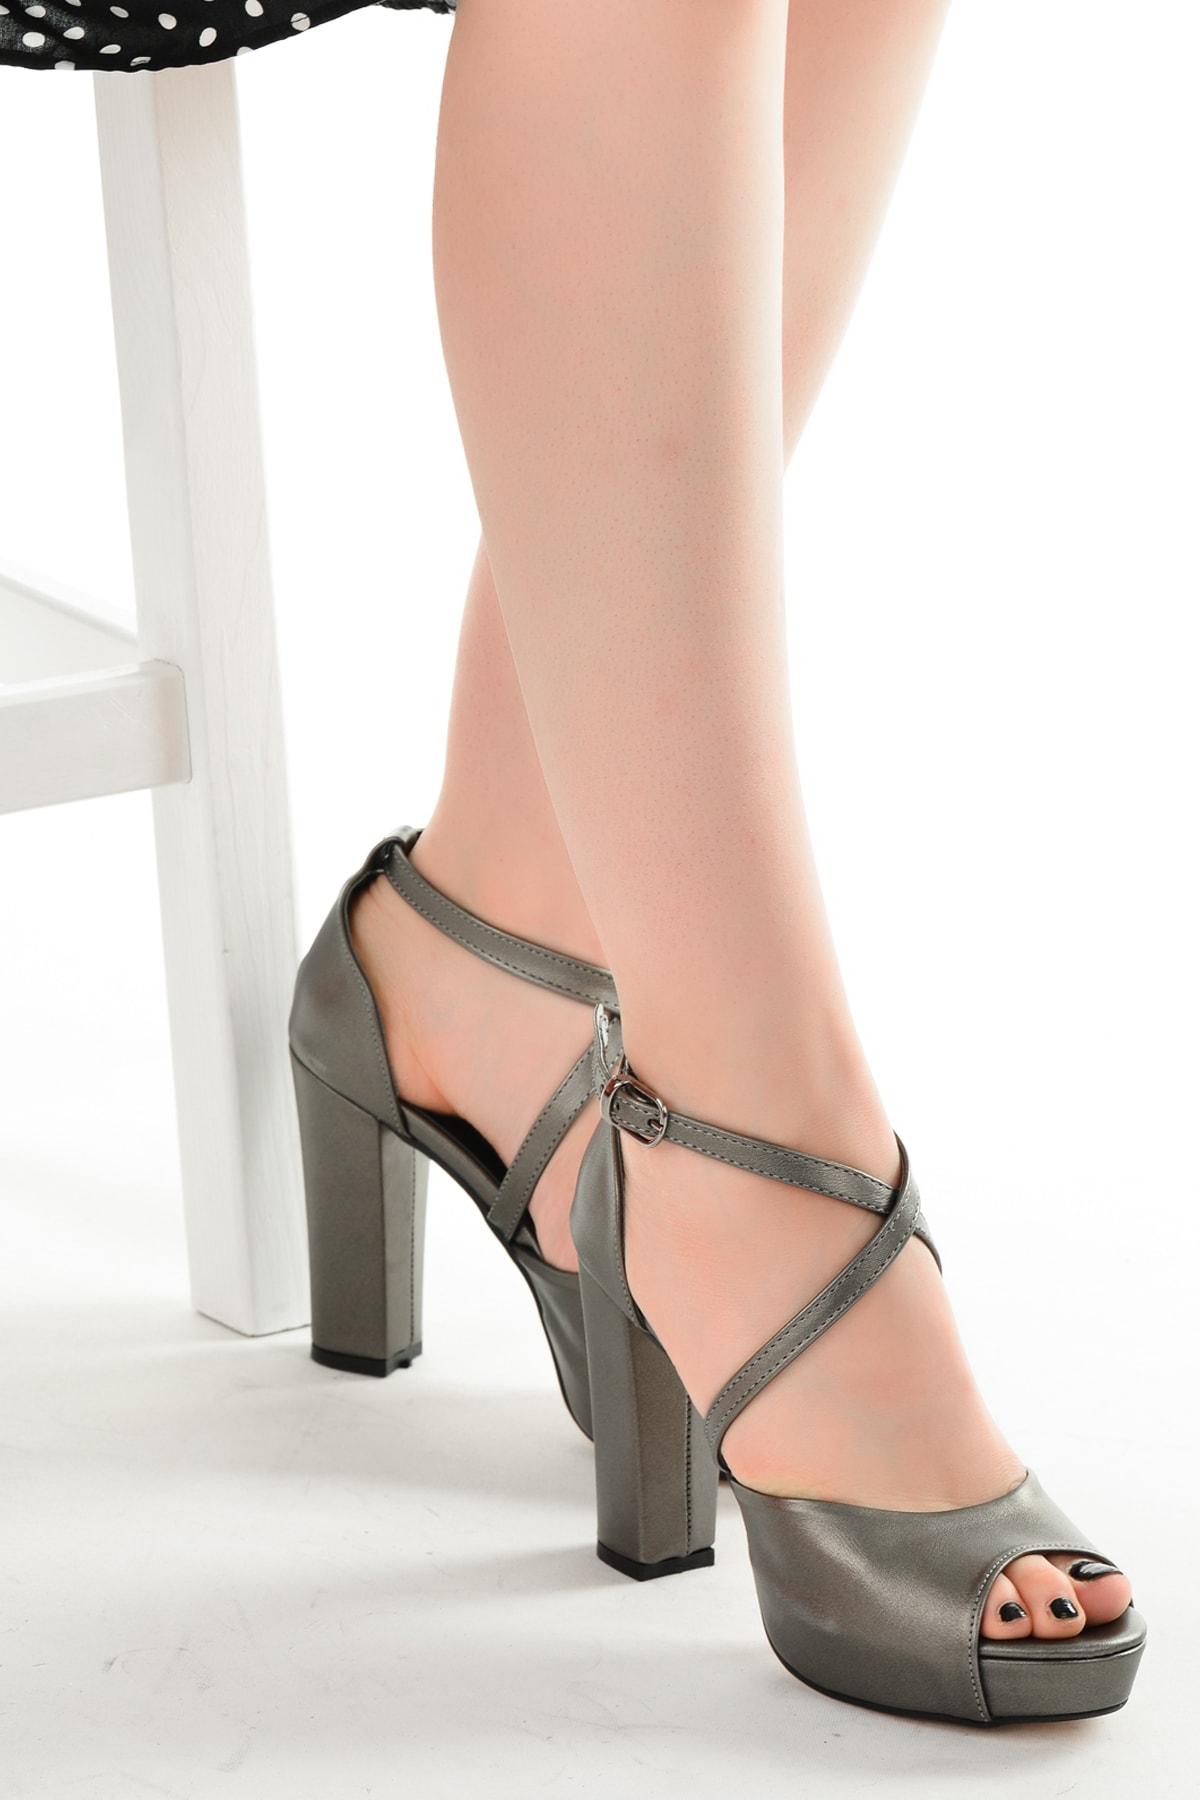 Ayakland Kadın Platin Platform Topuklu Ayakkabı 11 cm 3210-2058 1